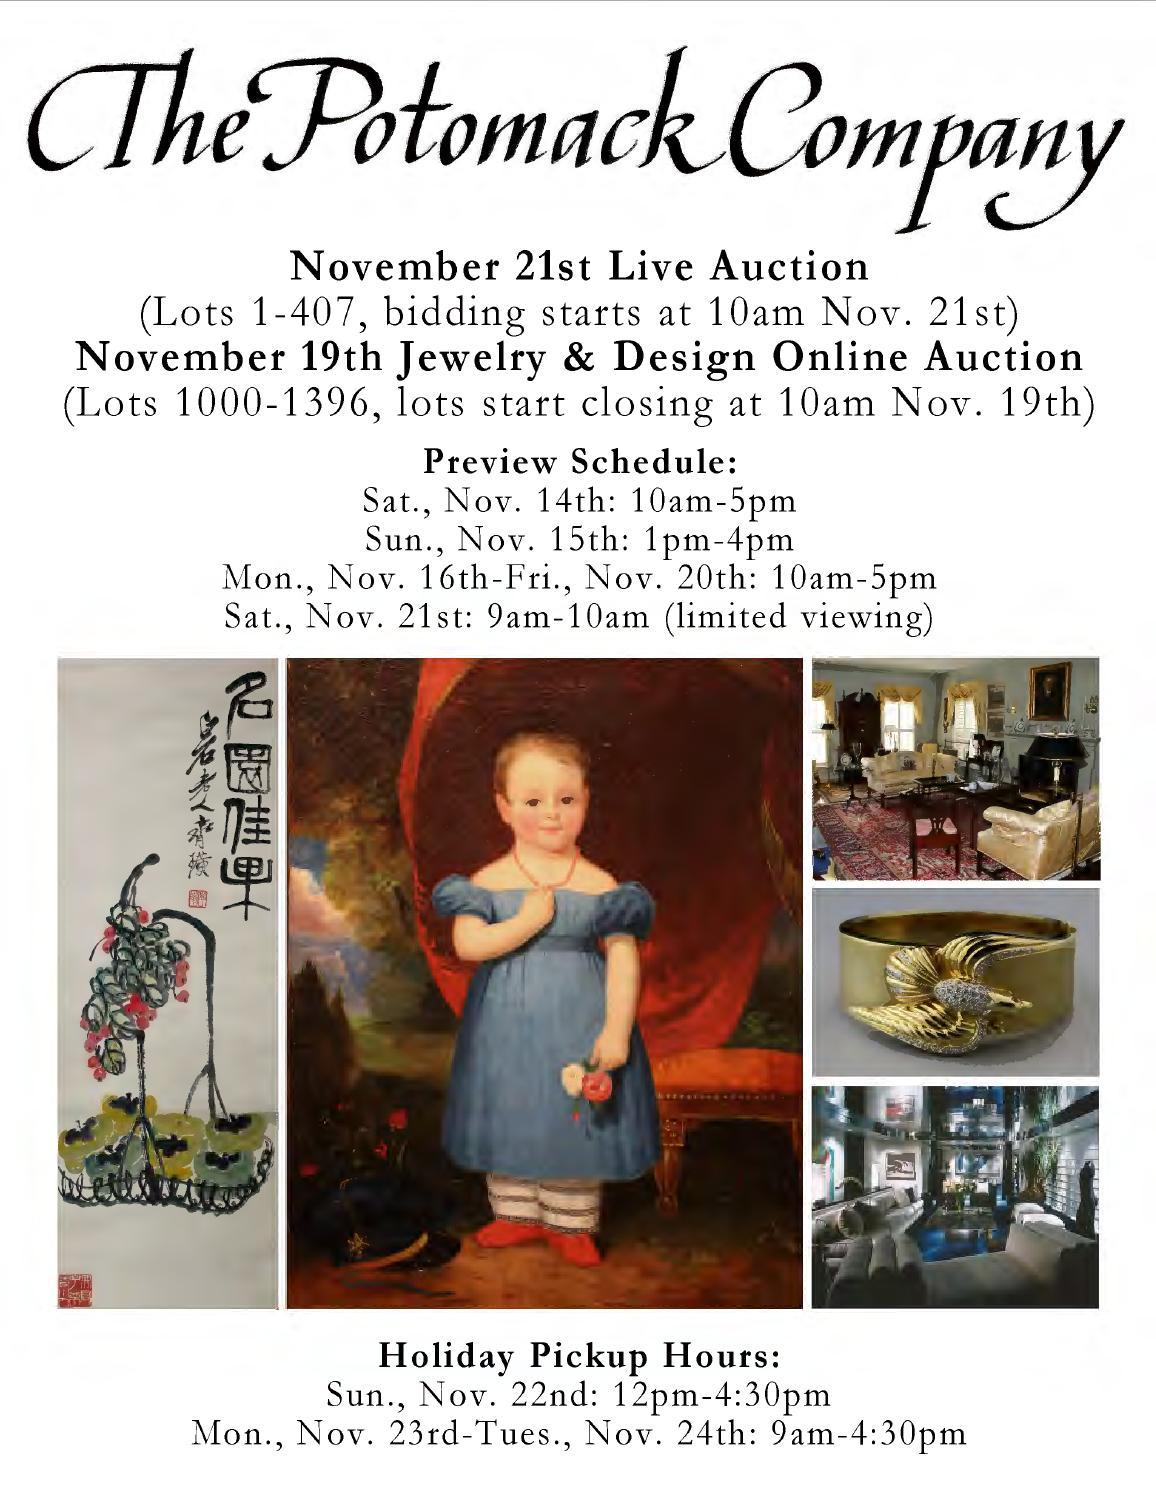 Potomack company nov 19th 21st auctions catalogues